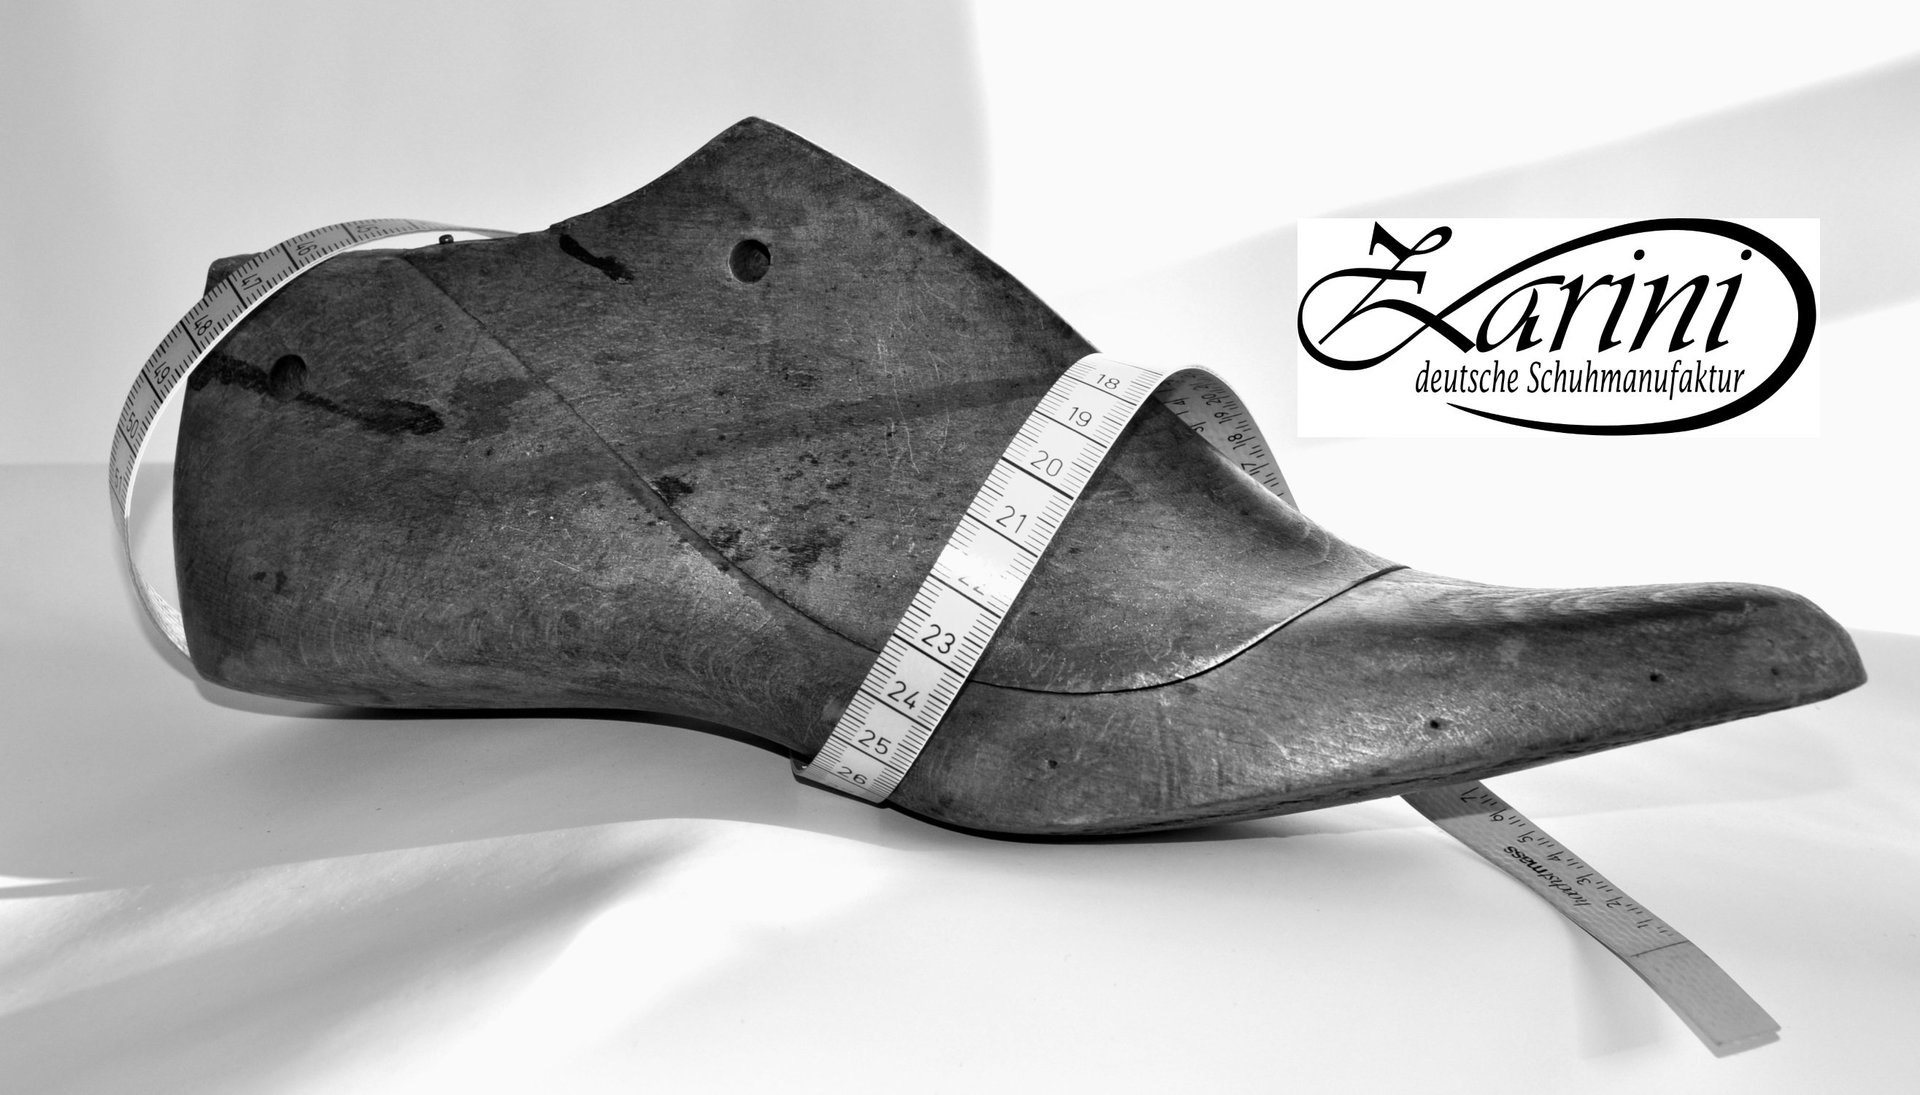 save off c2725 0be8f Maßschuhe Pirmasens-handgefertigte Schuhe passend zu Ihren ...